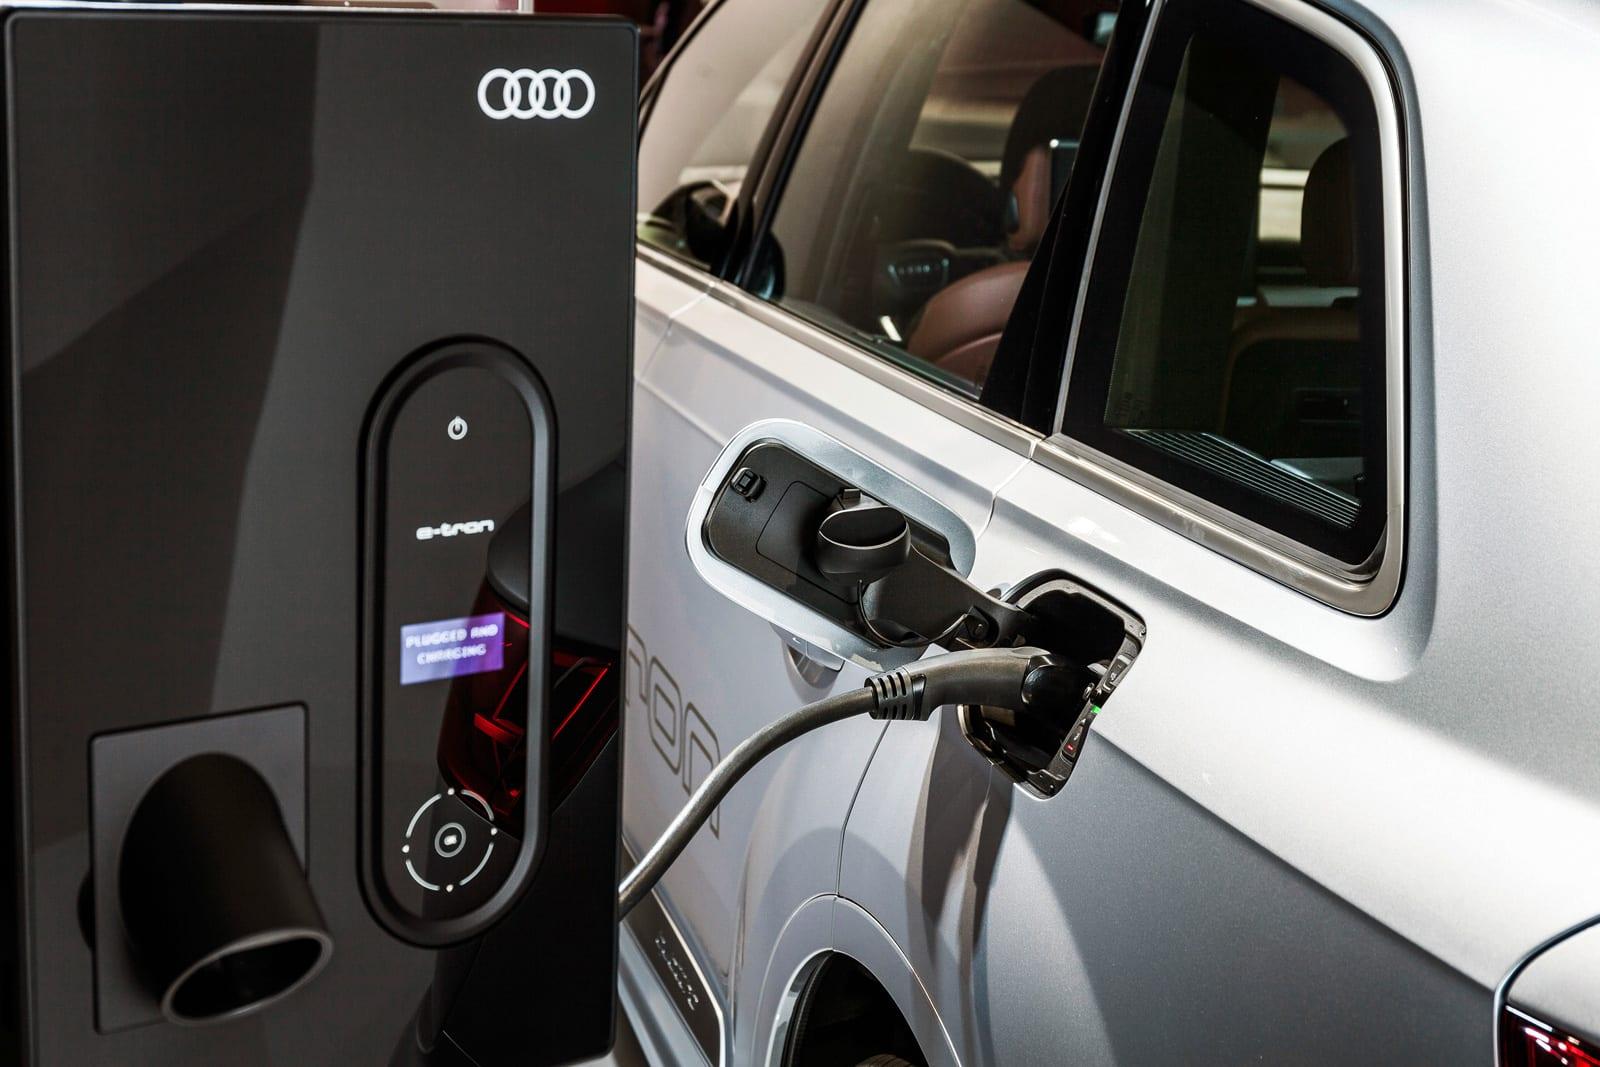 Audi smart home battery grid creates a 'virtual power plant'